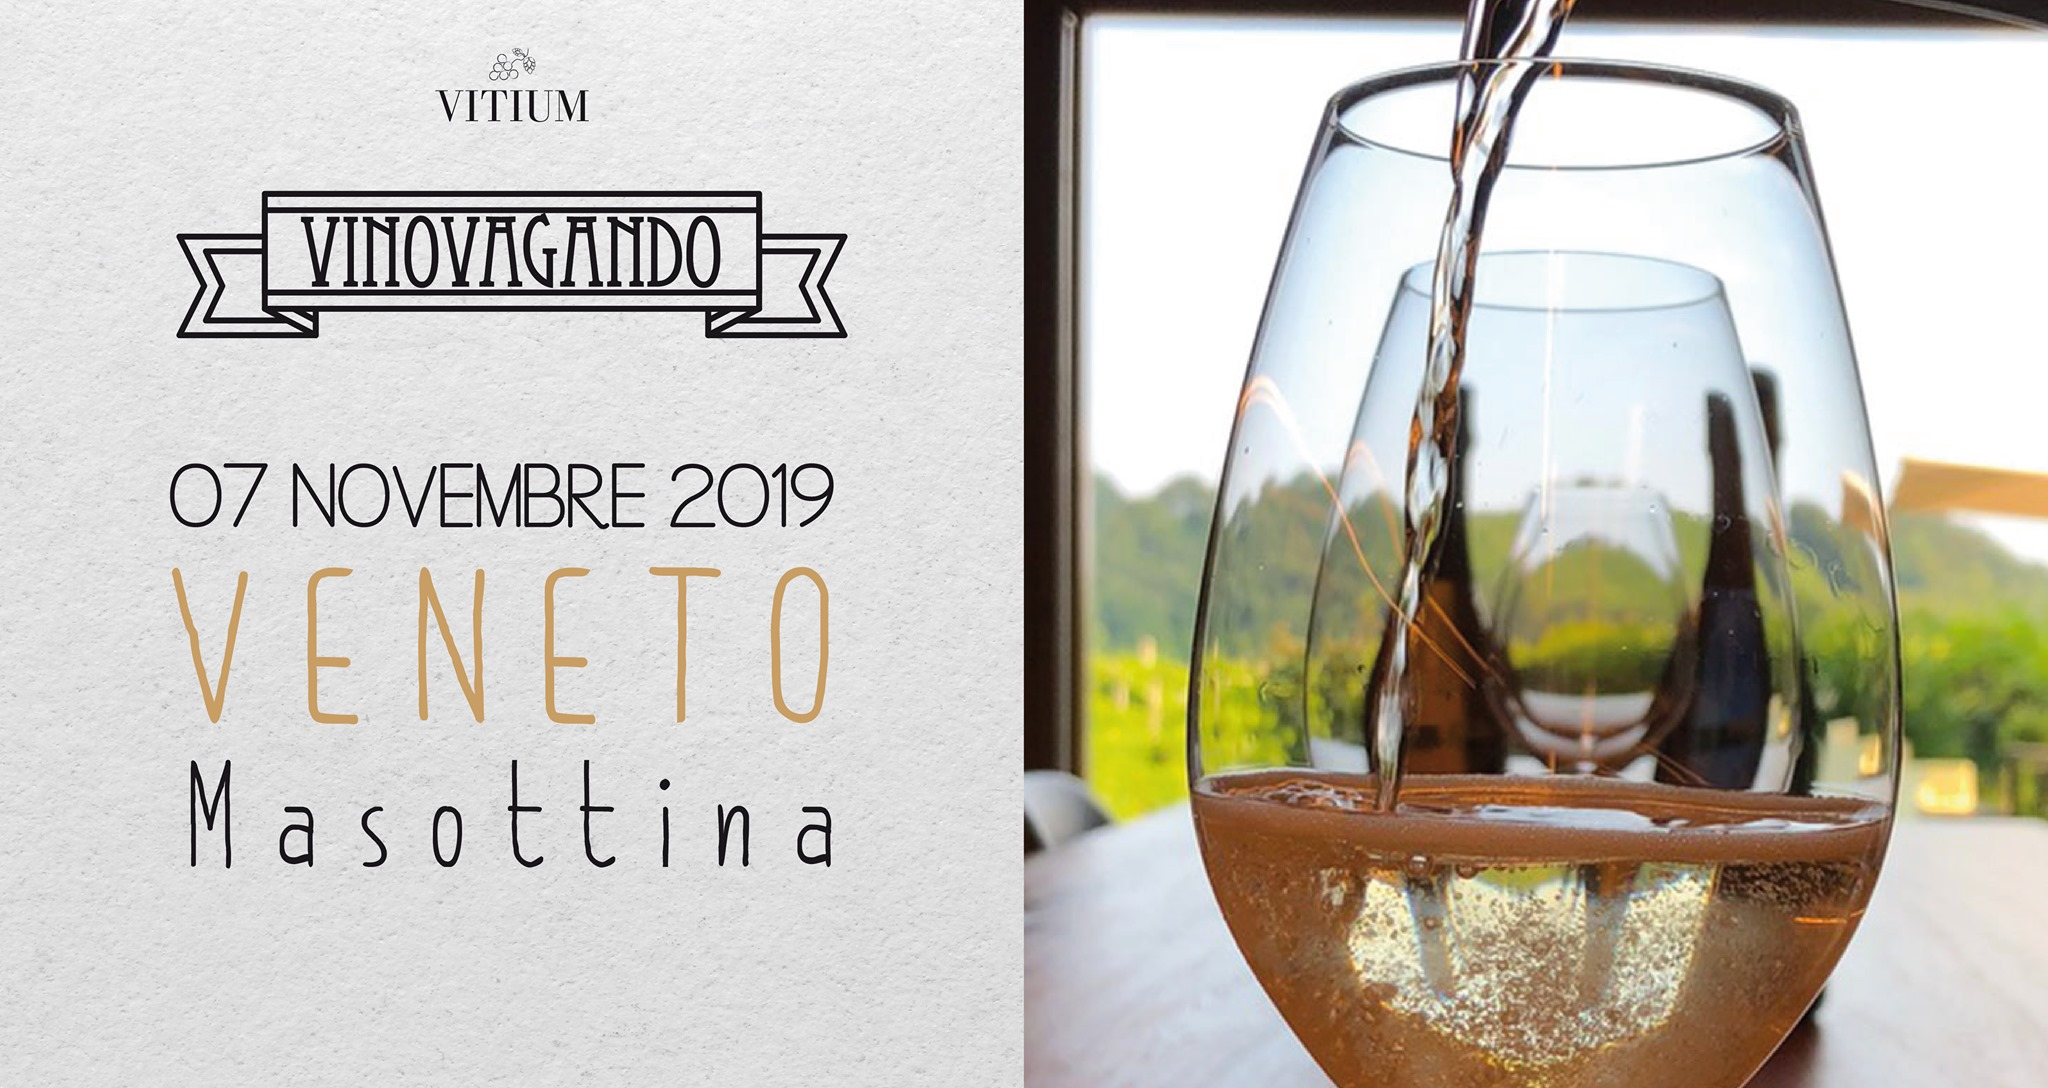 VinoVagando in Veneto – Masottina